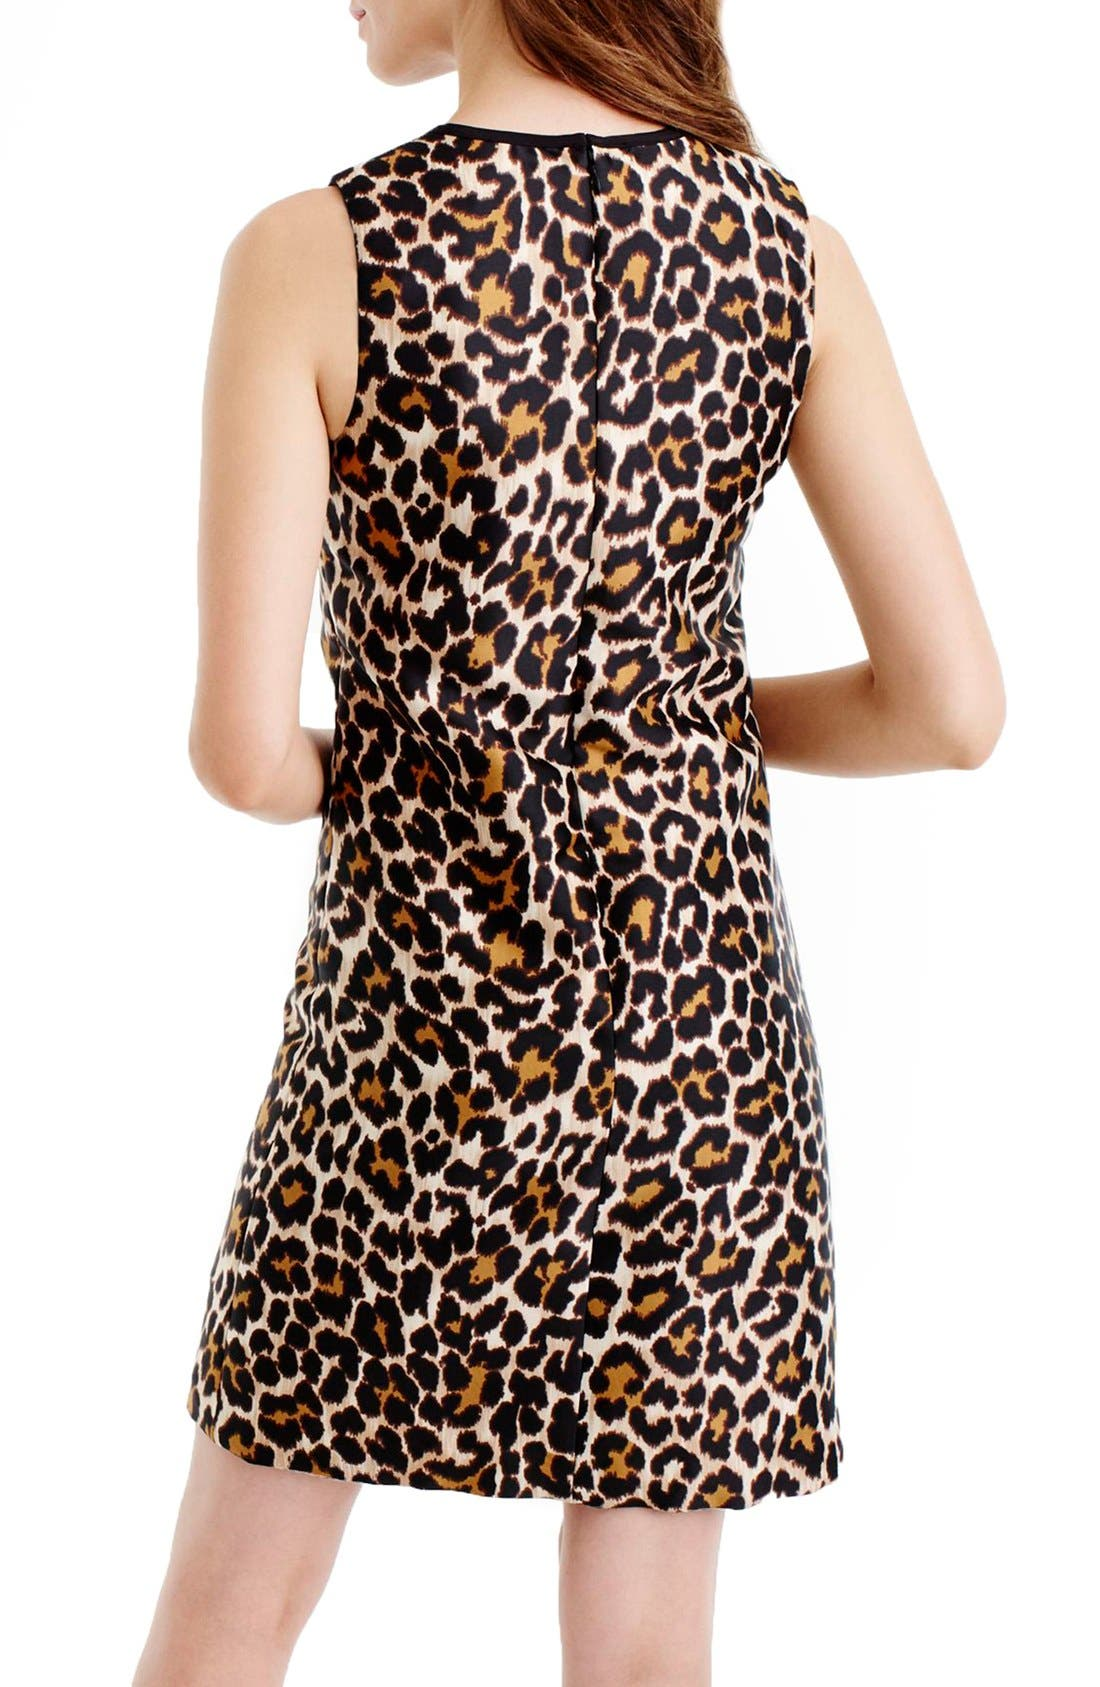 Alternate Image 3  - J.Crew Leopard Print Shift Dress (Regular & Petite)